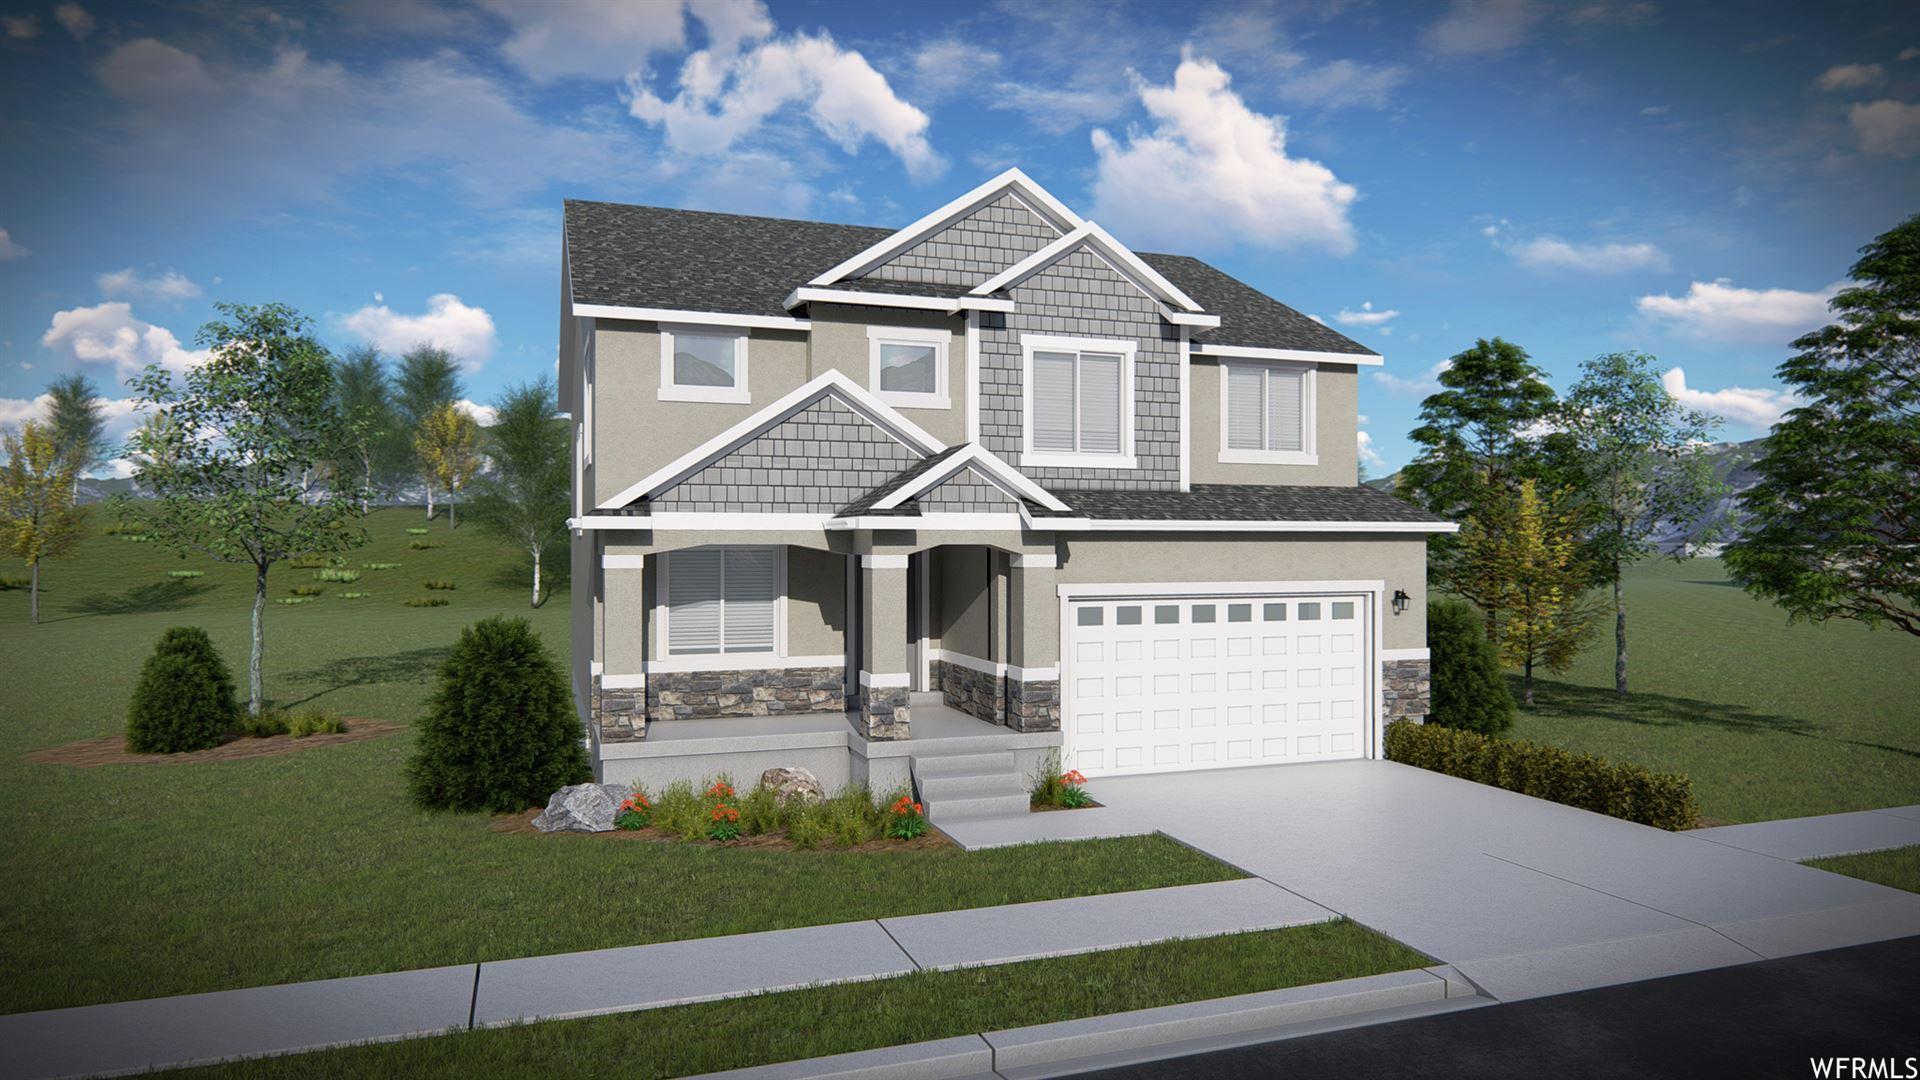 Photo of 1324 W QUAILHILL RD #1726, Saratoga Springs, UT 84045 (MLS # 1732081)